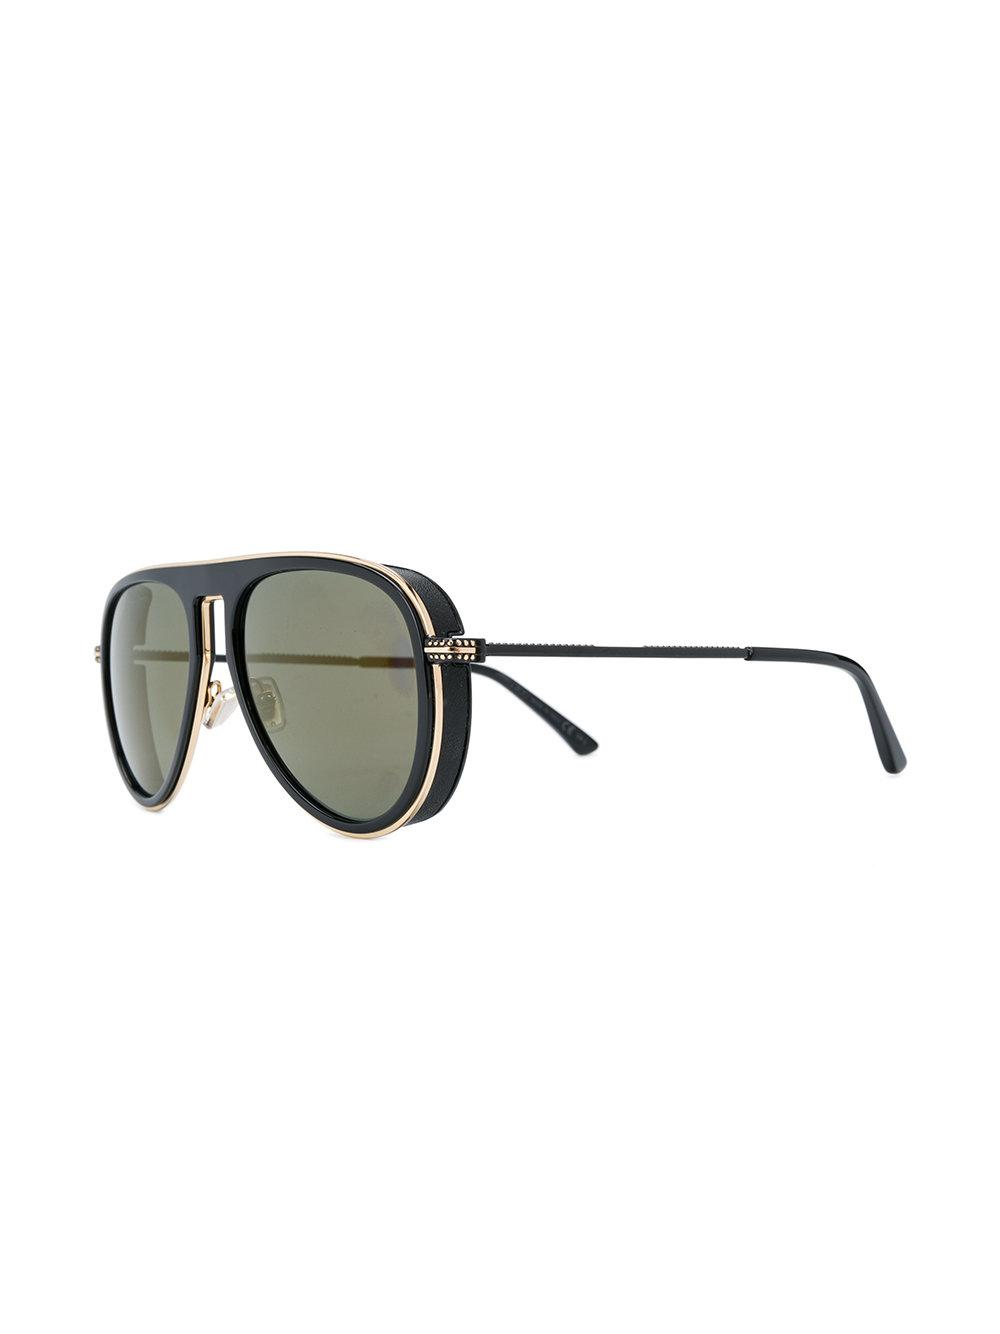 Jimmy Choo Carl/s Sunglasses in Black for Men